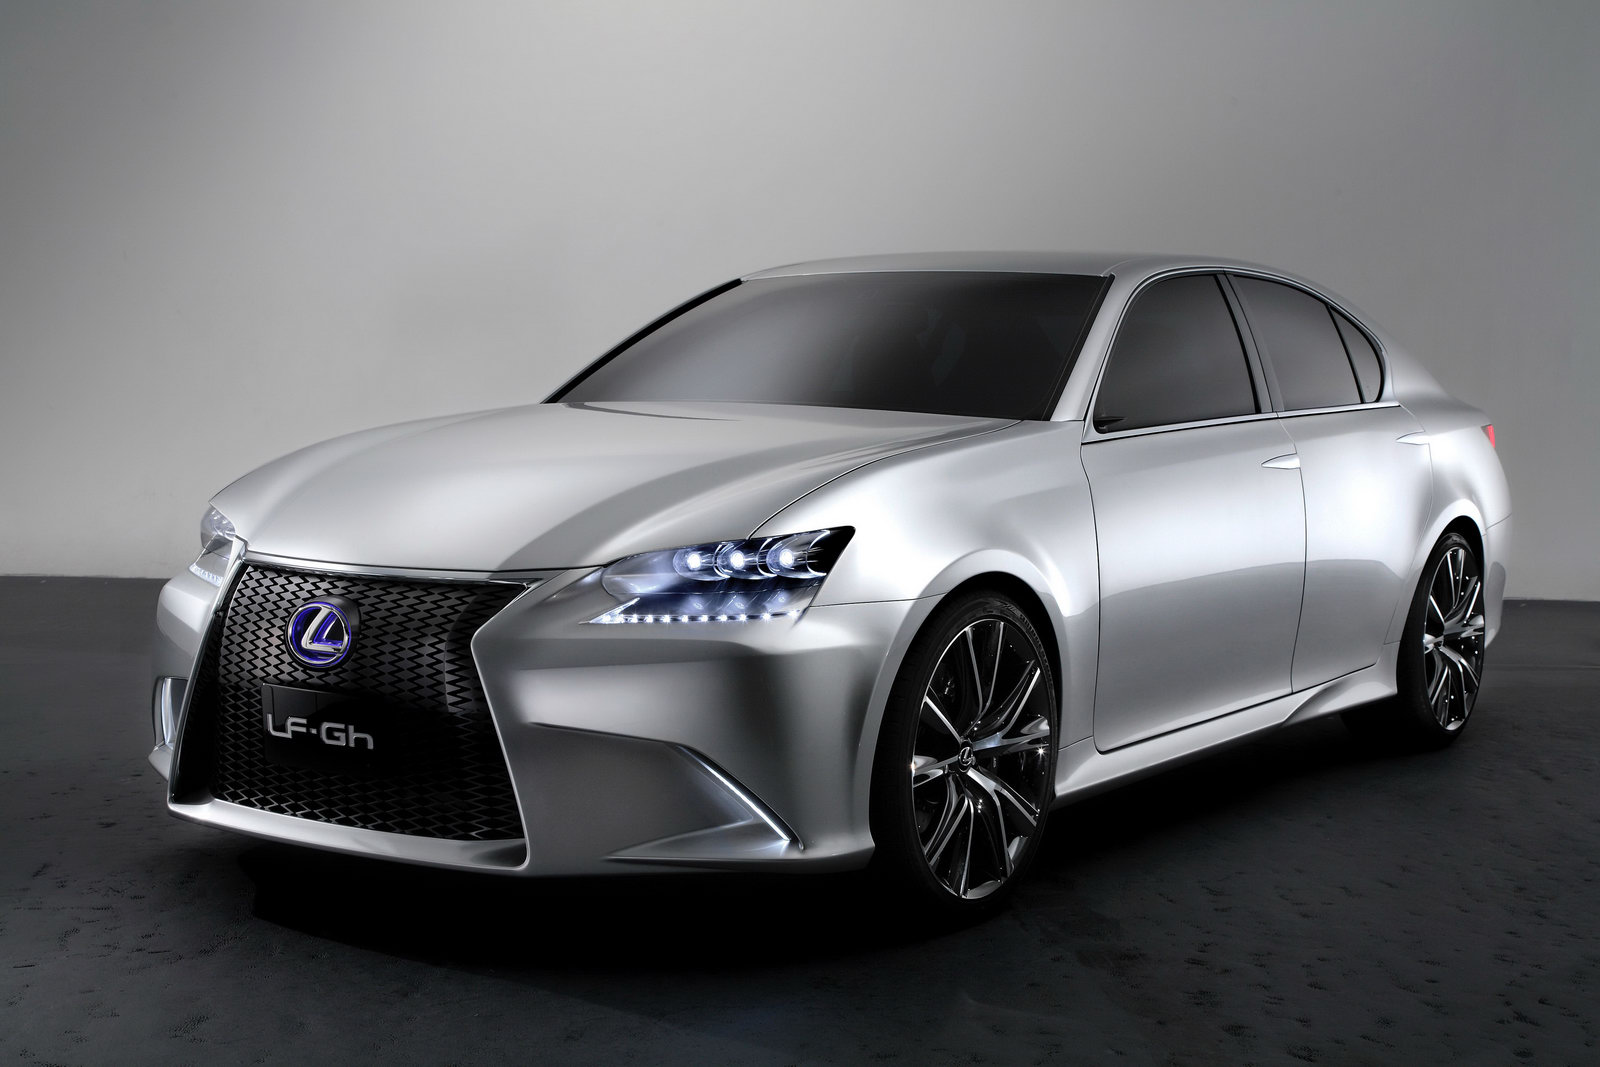 Lexus LFGh Concept hybrid sport sedan Free Download Image Of